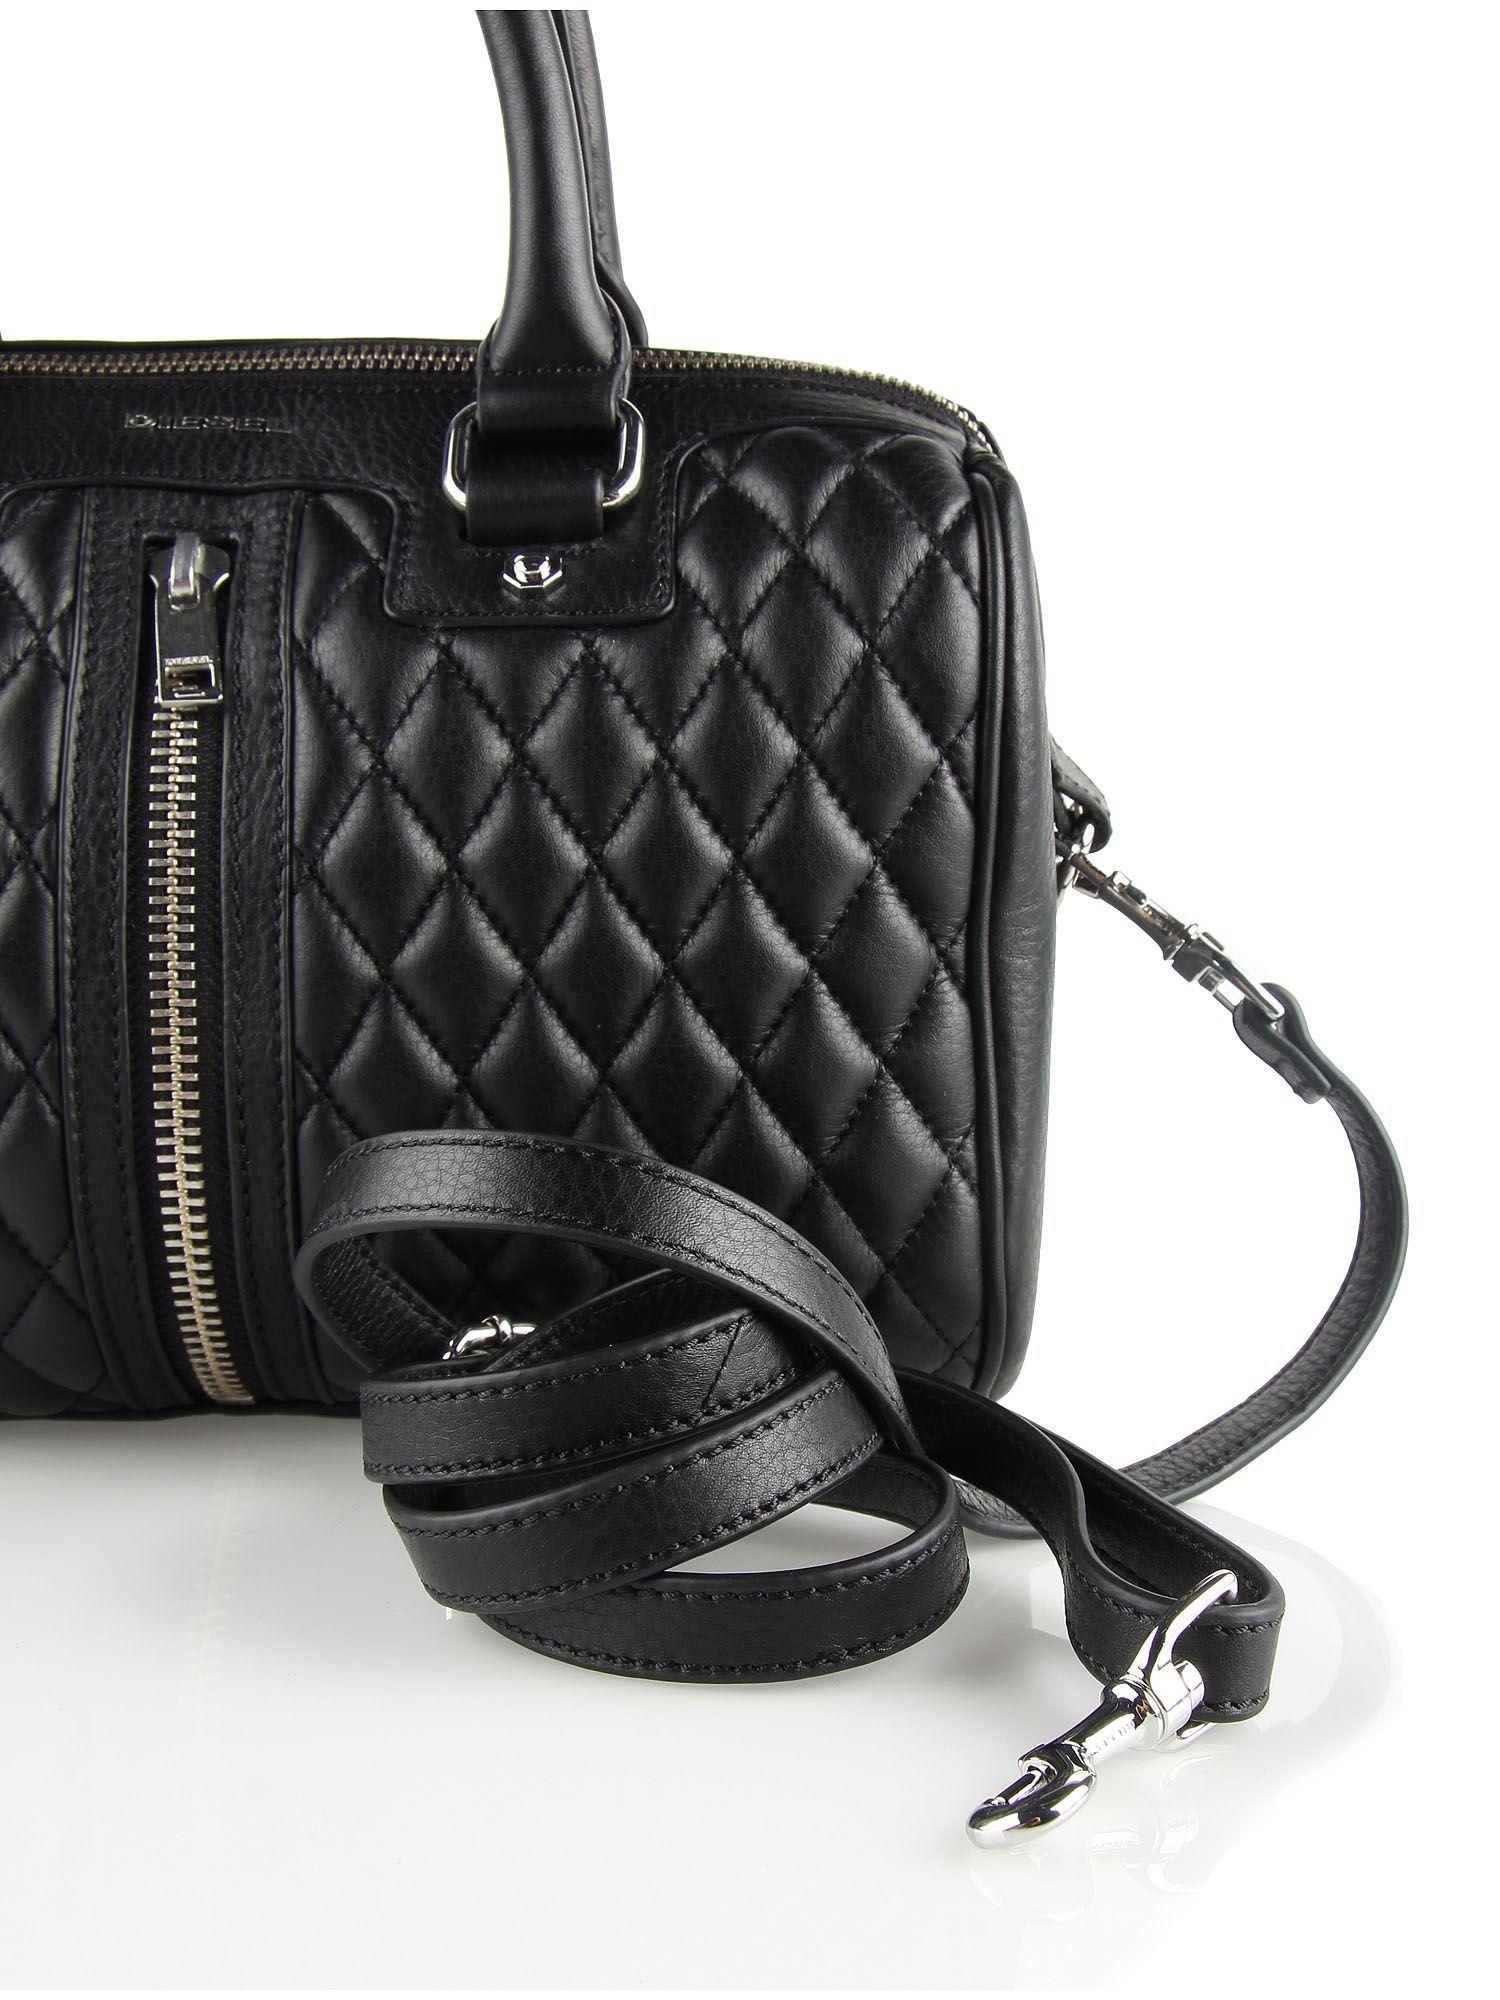 designer fashion 84567 36080 Diesel LE AXELLE ZIP Handbag. Find out more on Diesel Online ...